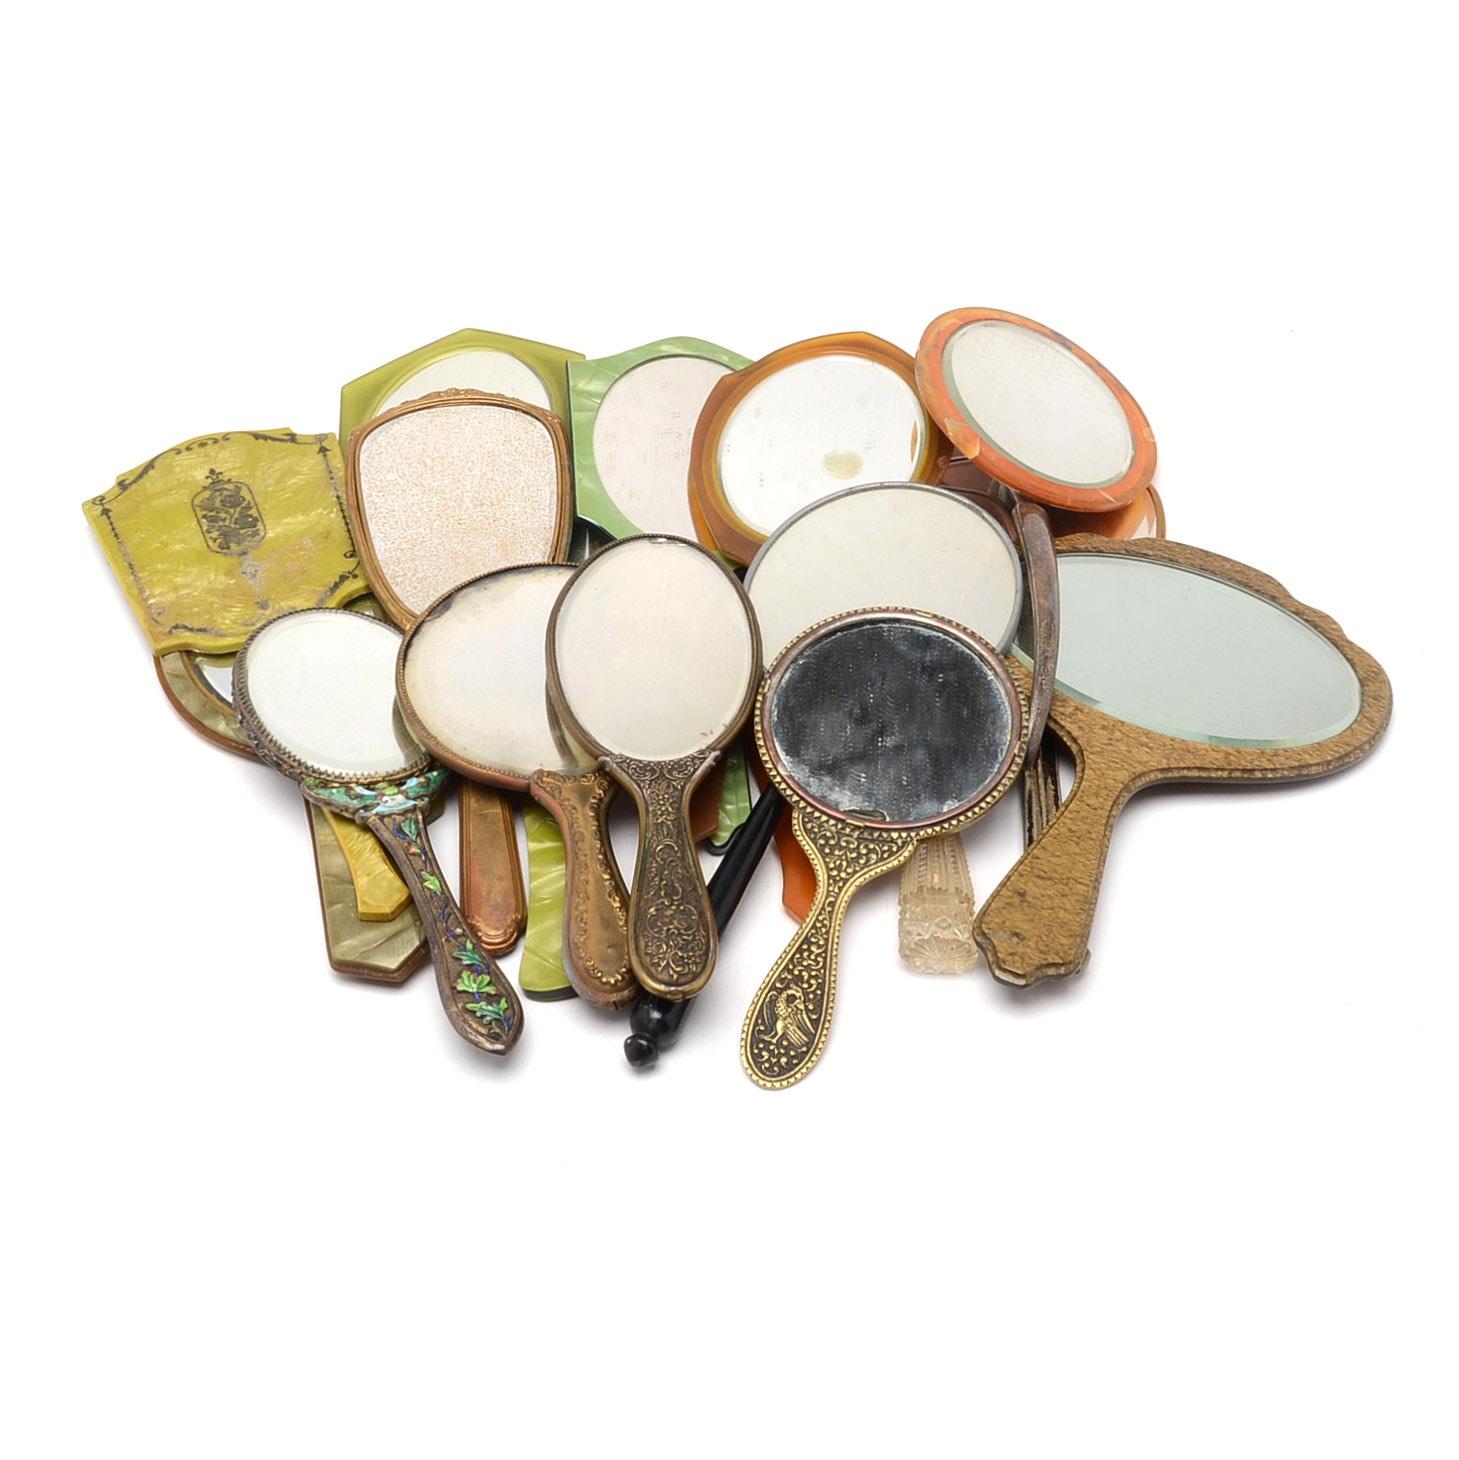 Selection of Mid-Century Hand-Held Vanity Mirrors